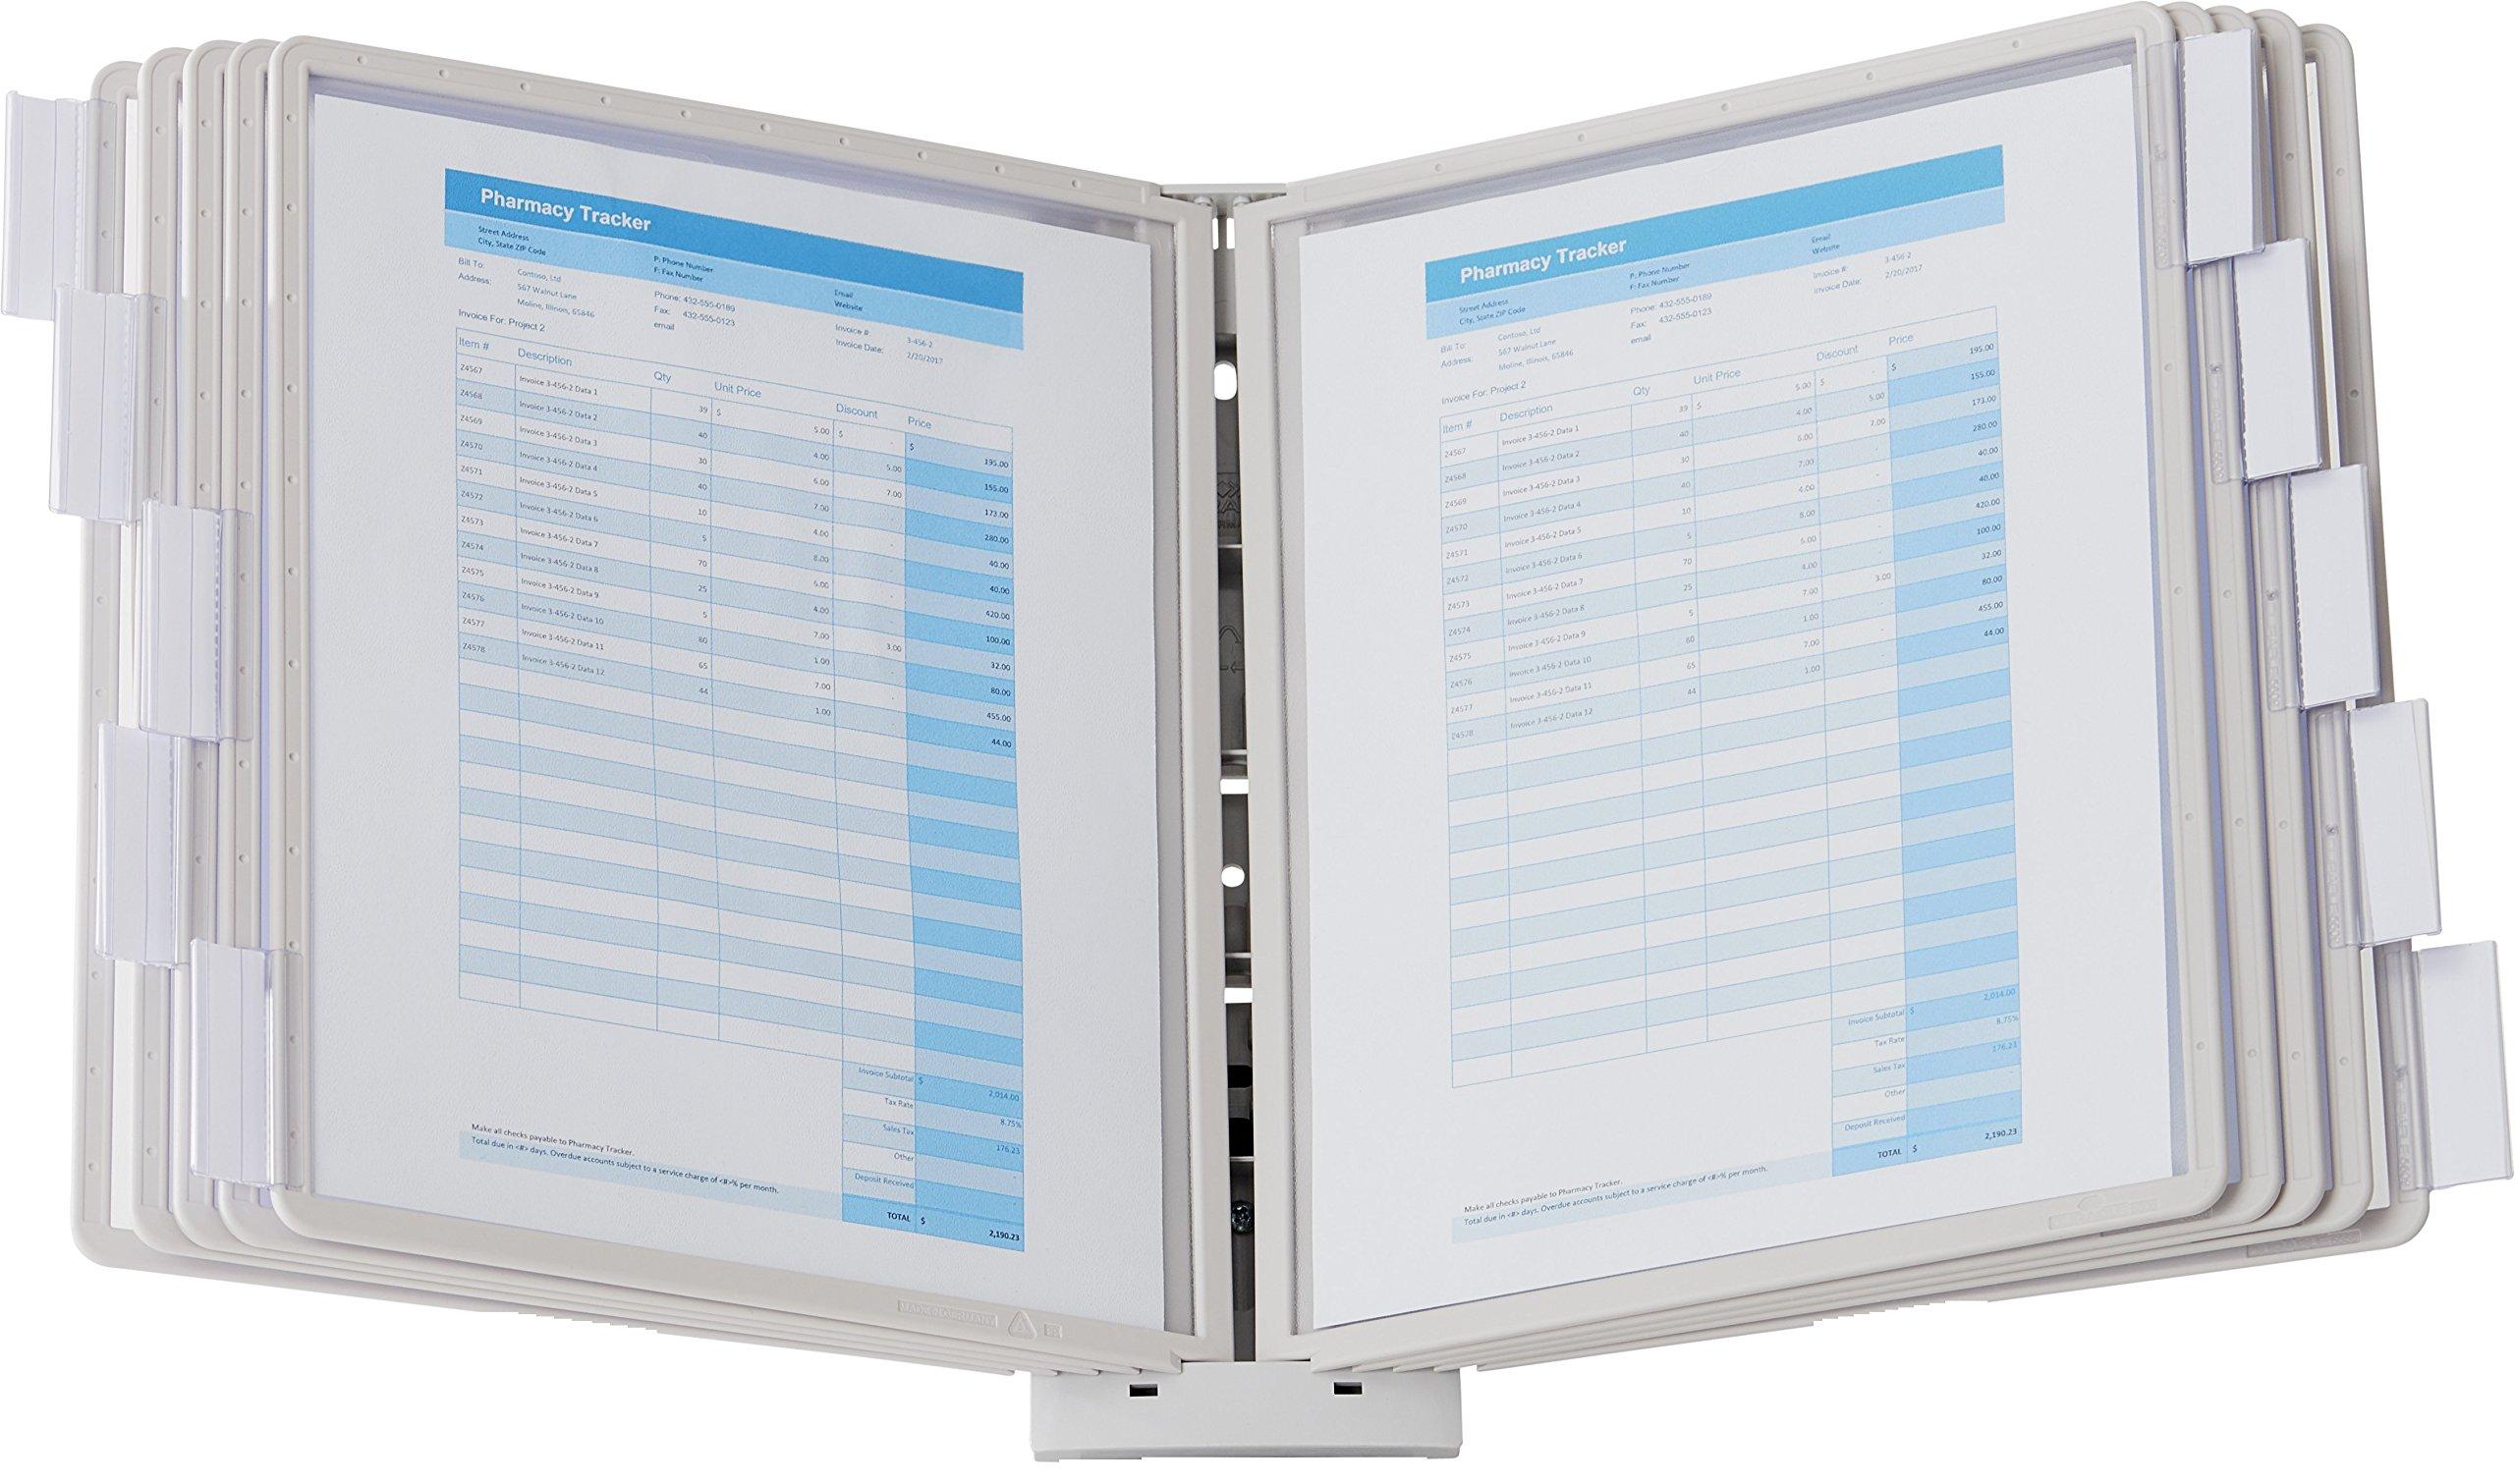 DURABLE Sherpa 10-Panel Wall Display System, Gray Borders (554110)